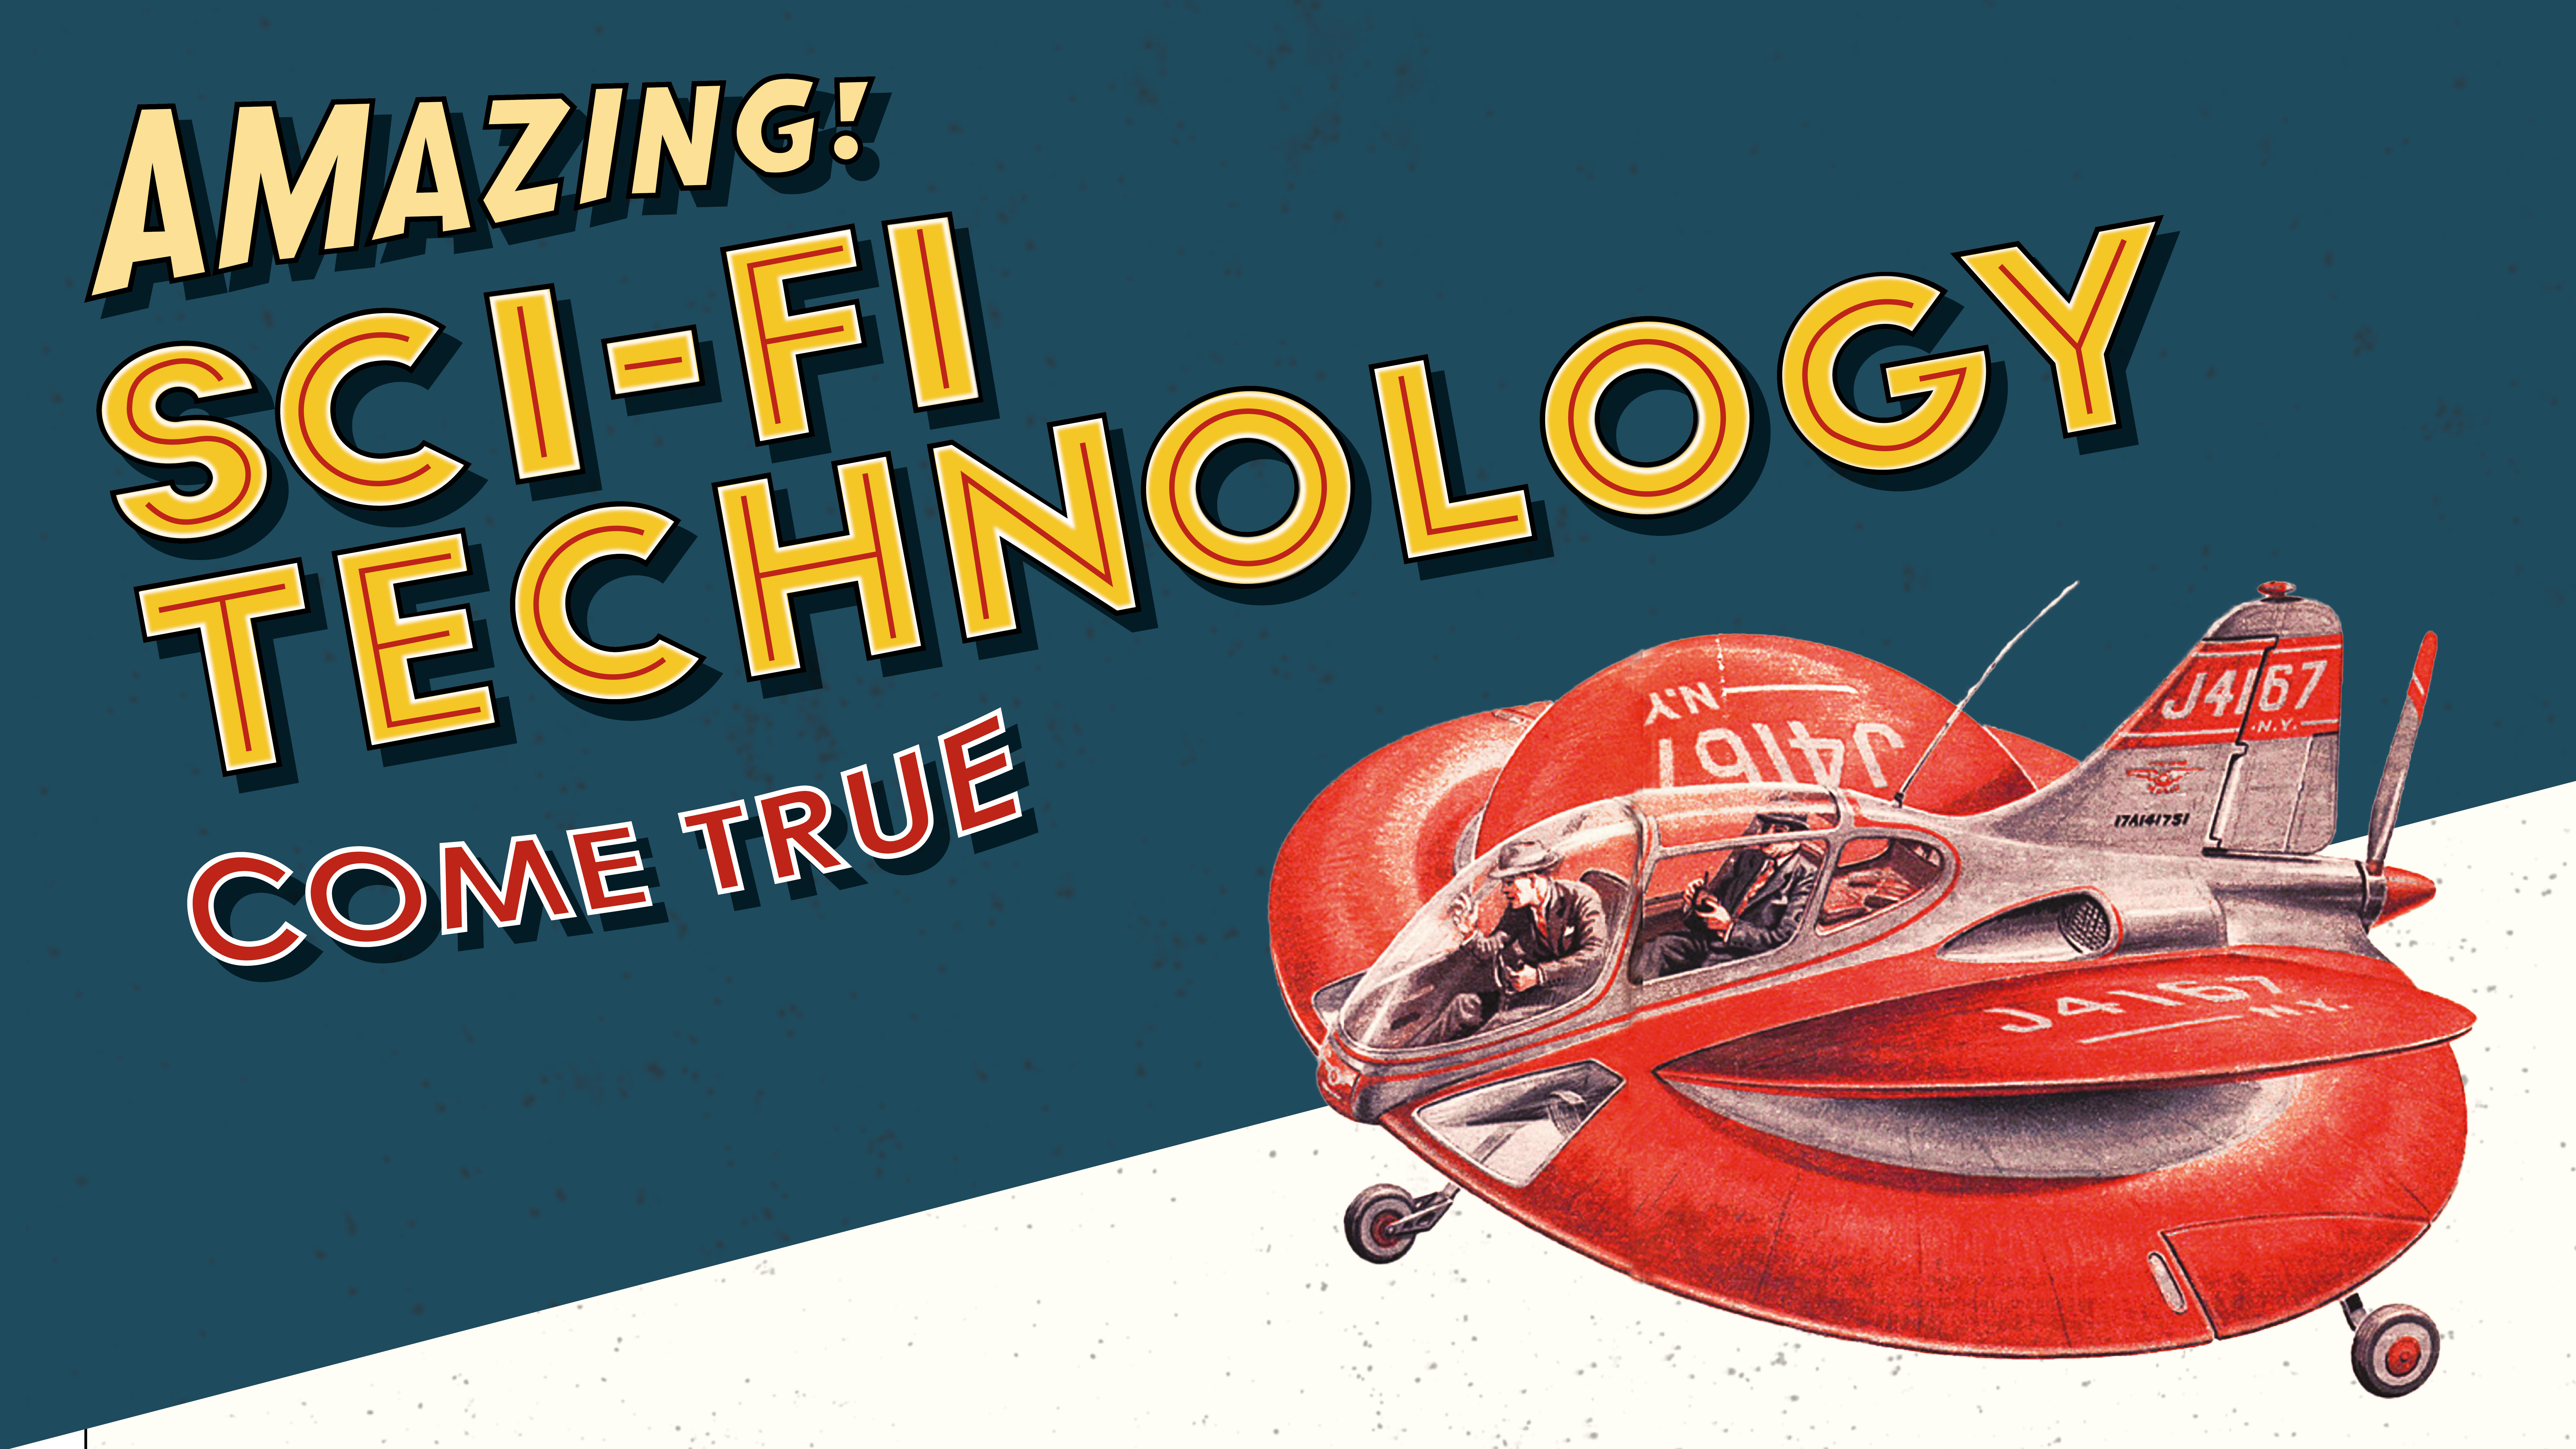 Amazing Sci-Fi Technology Come True